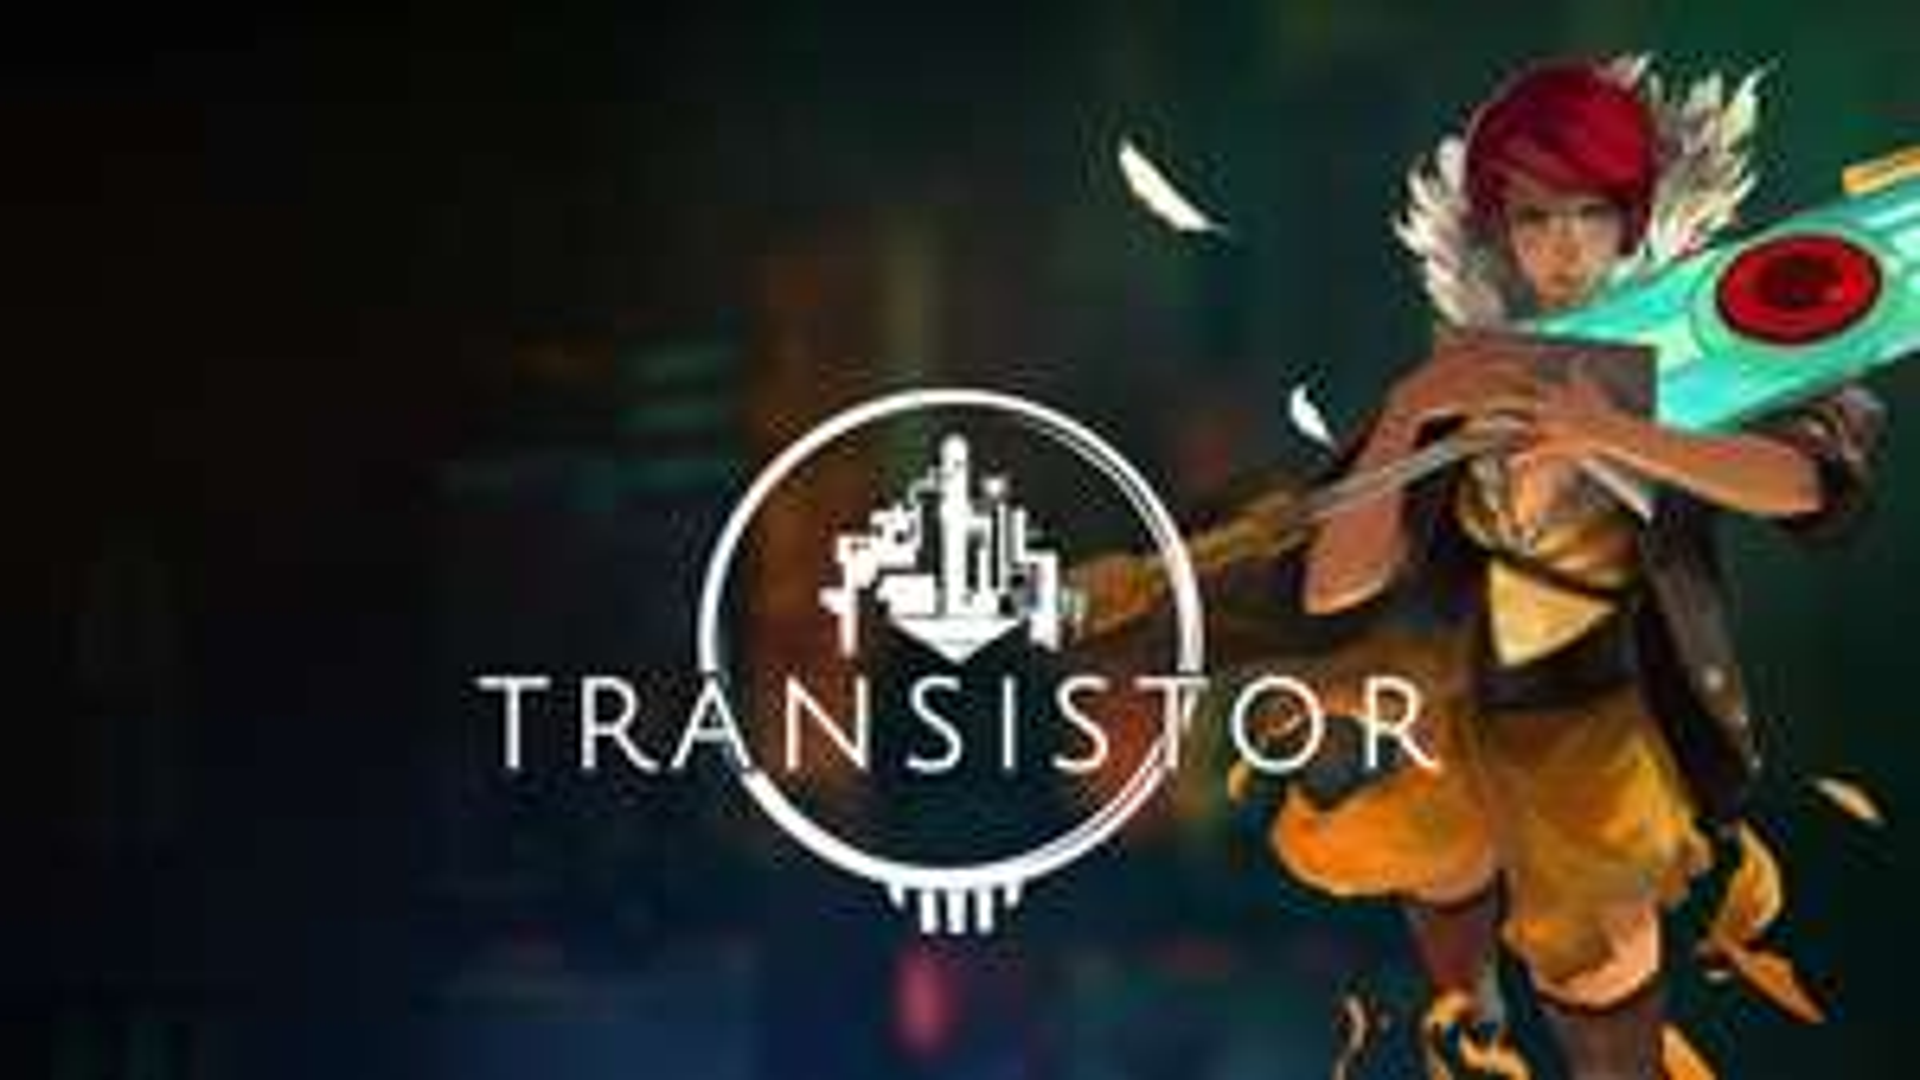 Nintendo eShop: Transistor (Nintendo switch)